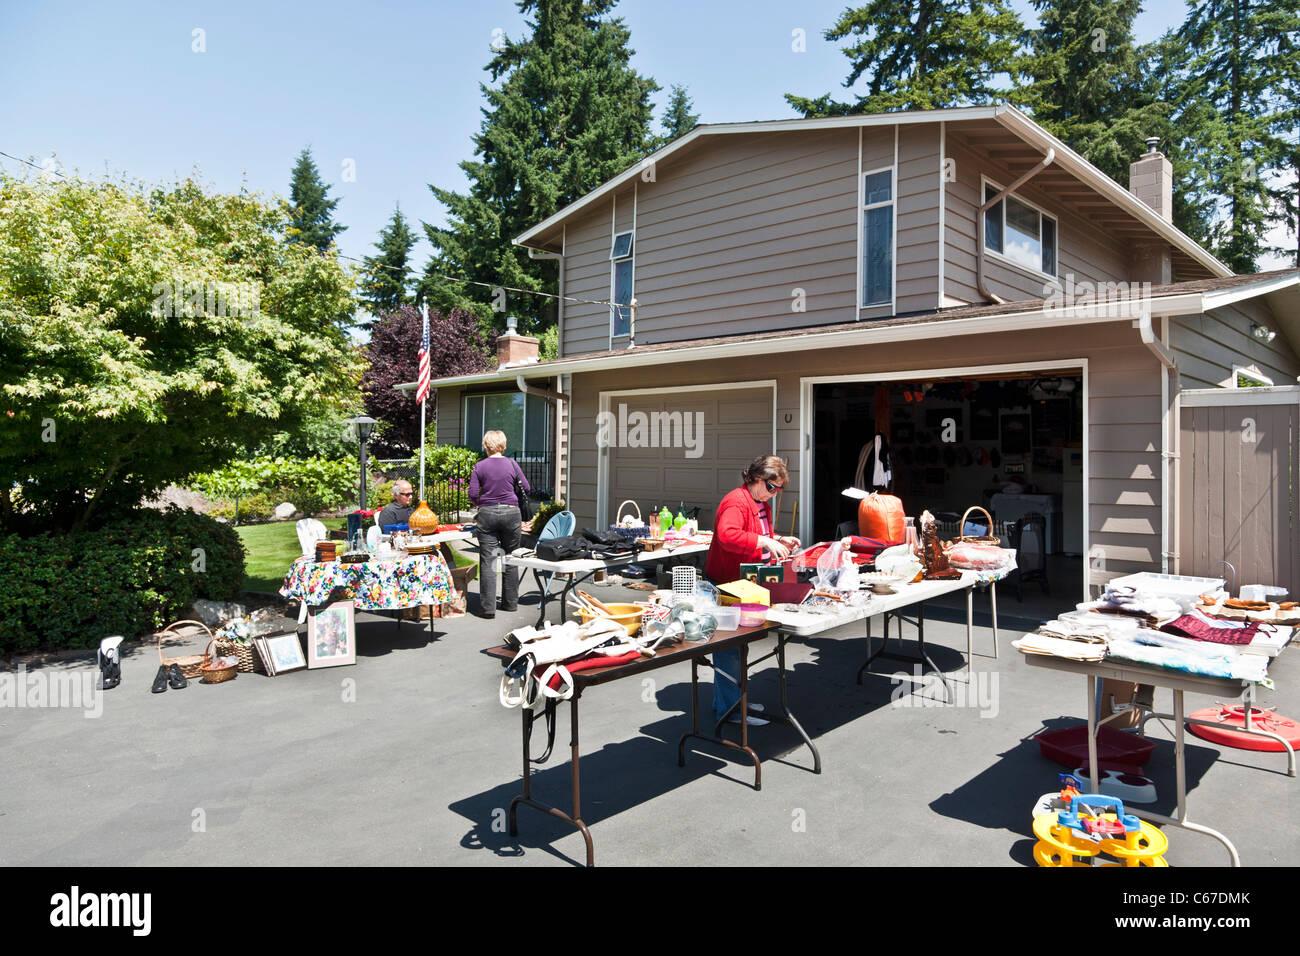 garage yard sale used clothes artwork dishes bric a brac kitsch in driveway outside suburban house Edmonds Washington - Stock Image